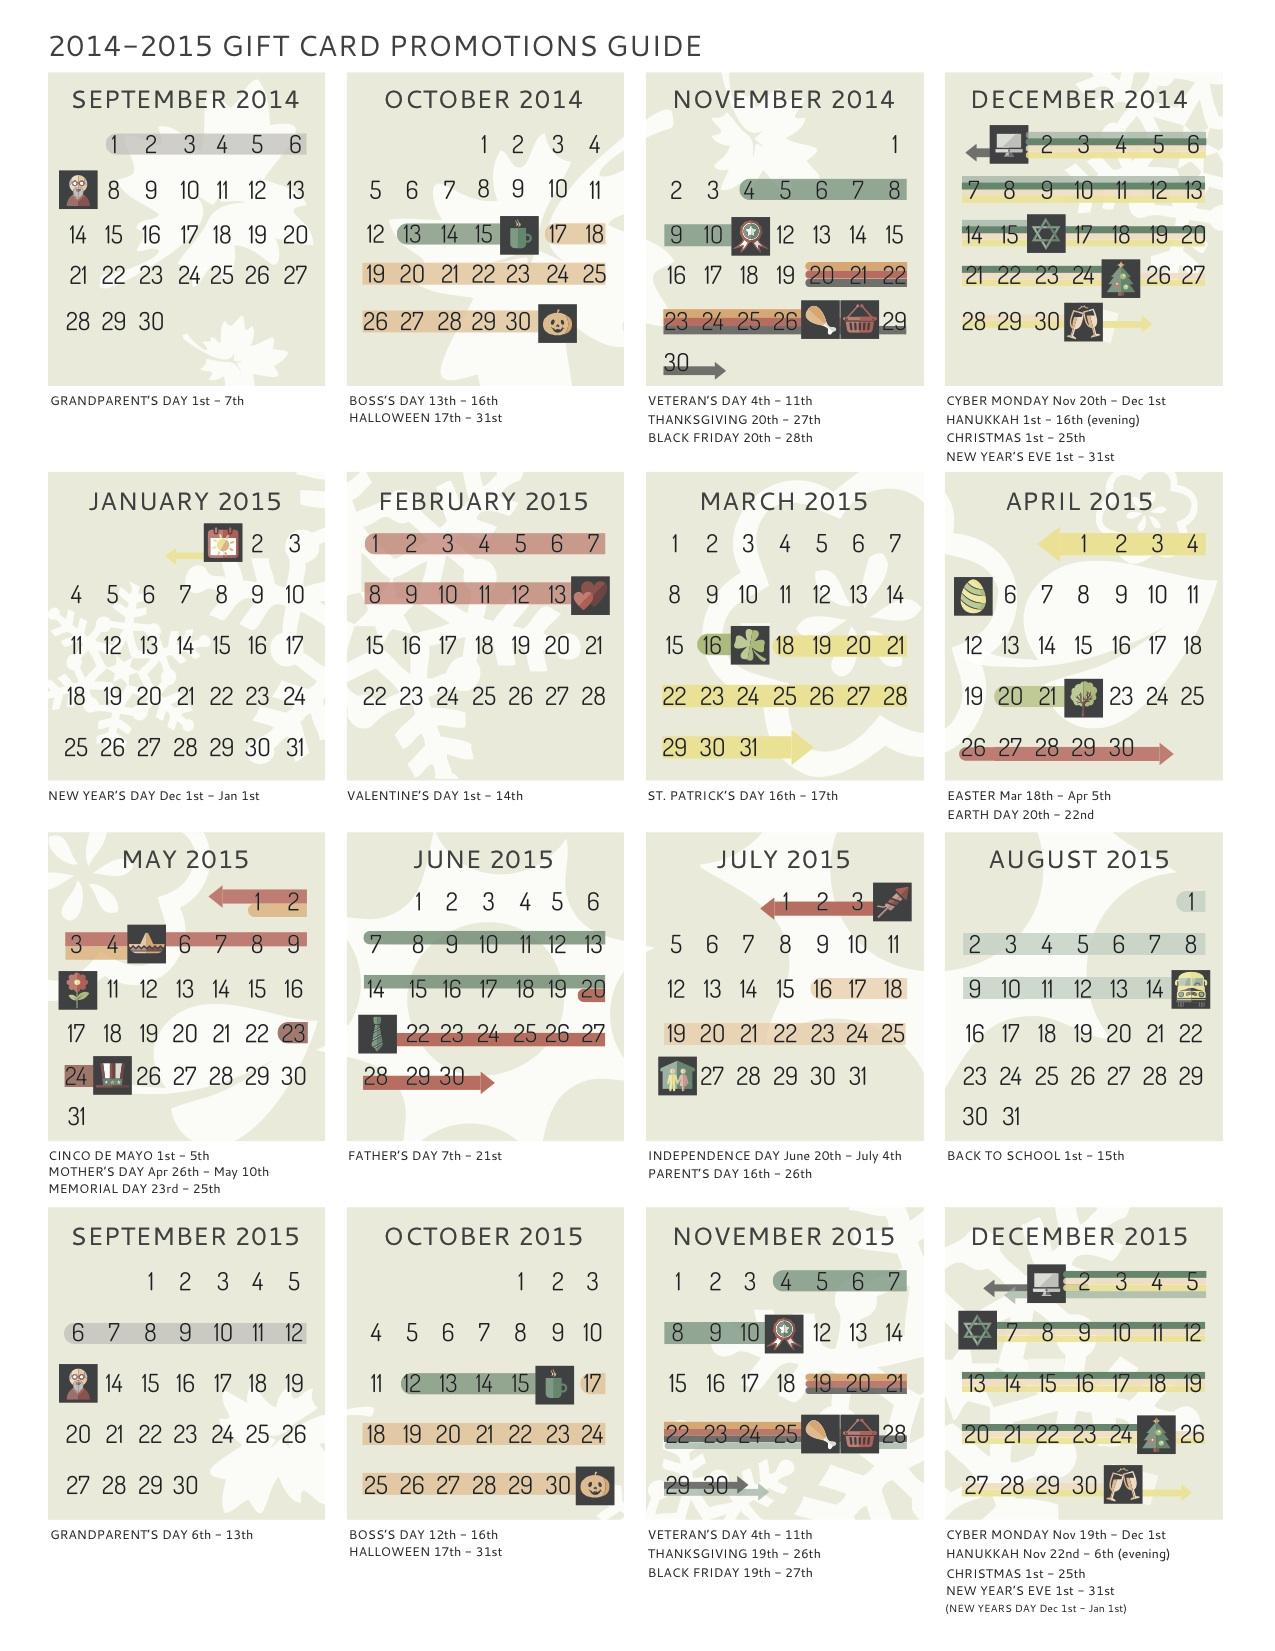 GF-ebook-calendar-chart-02